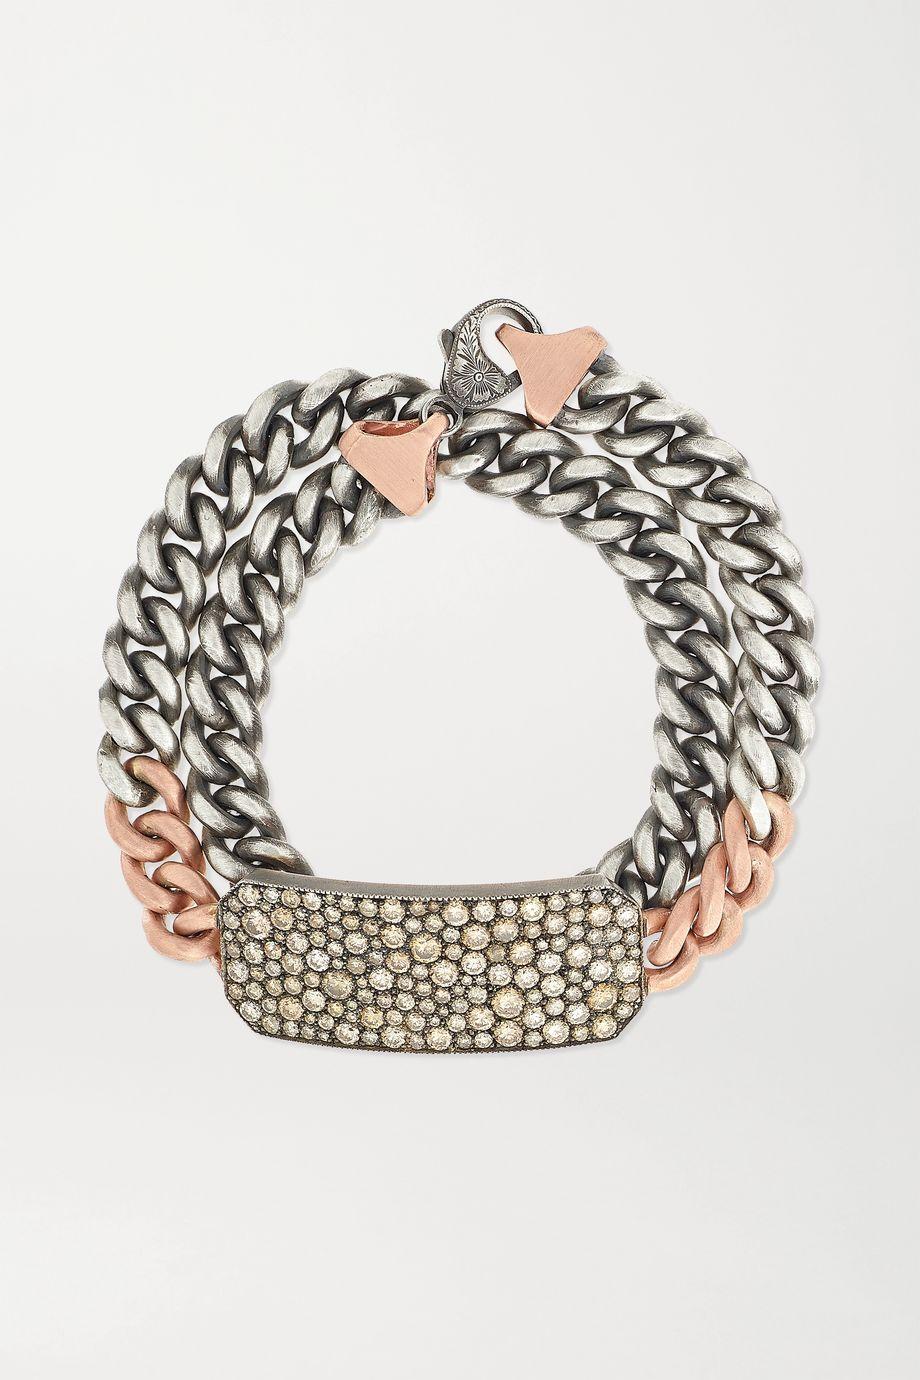 Sylva & Cie Ten Table Armband aus 14 Karat Roségold und Sterlingsilber mit Diamanten